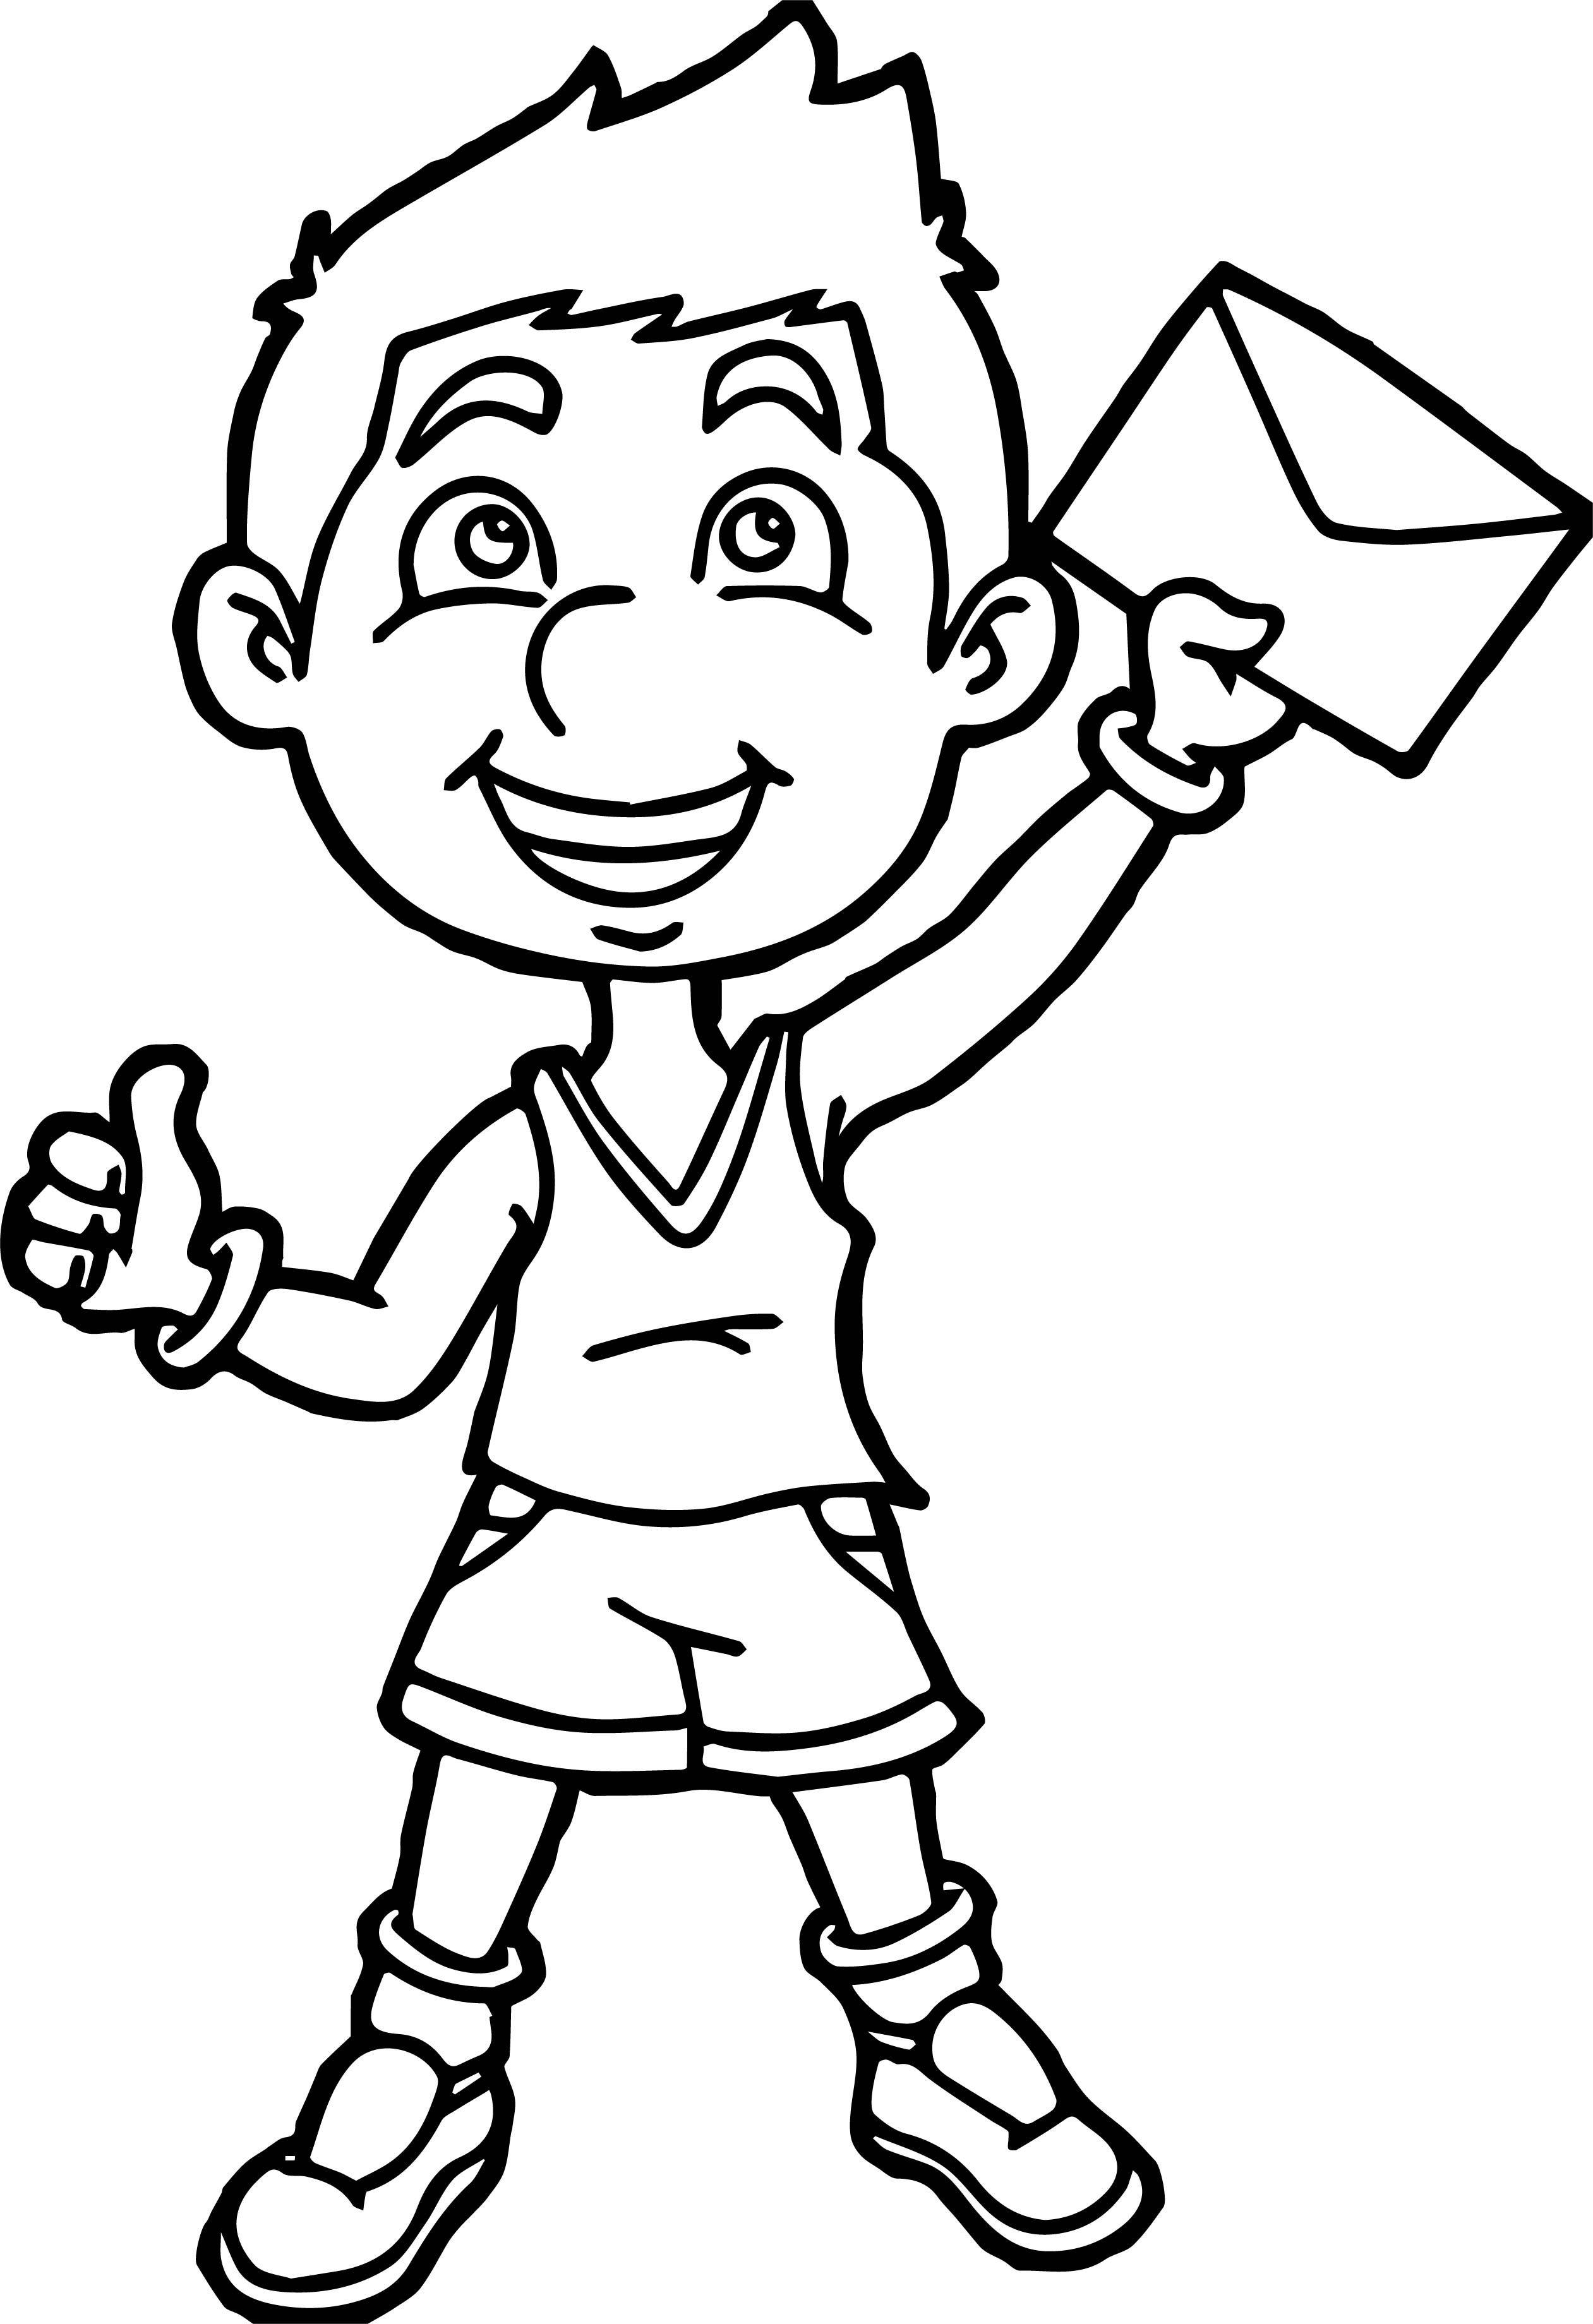 Nice Sport Boy Winner Post Coloring Page Sports Coloring Pages Santa Coloring Pages Coloring Pages [ 3680 x 2522 Pixel ]